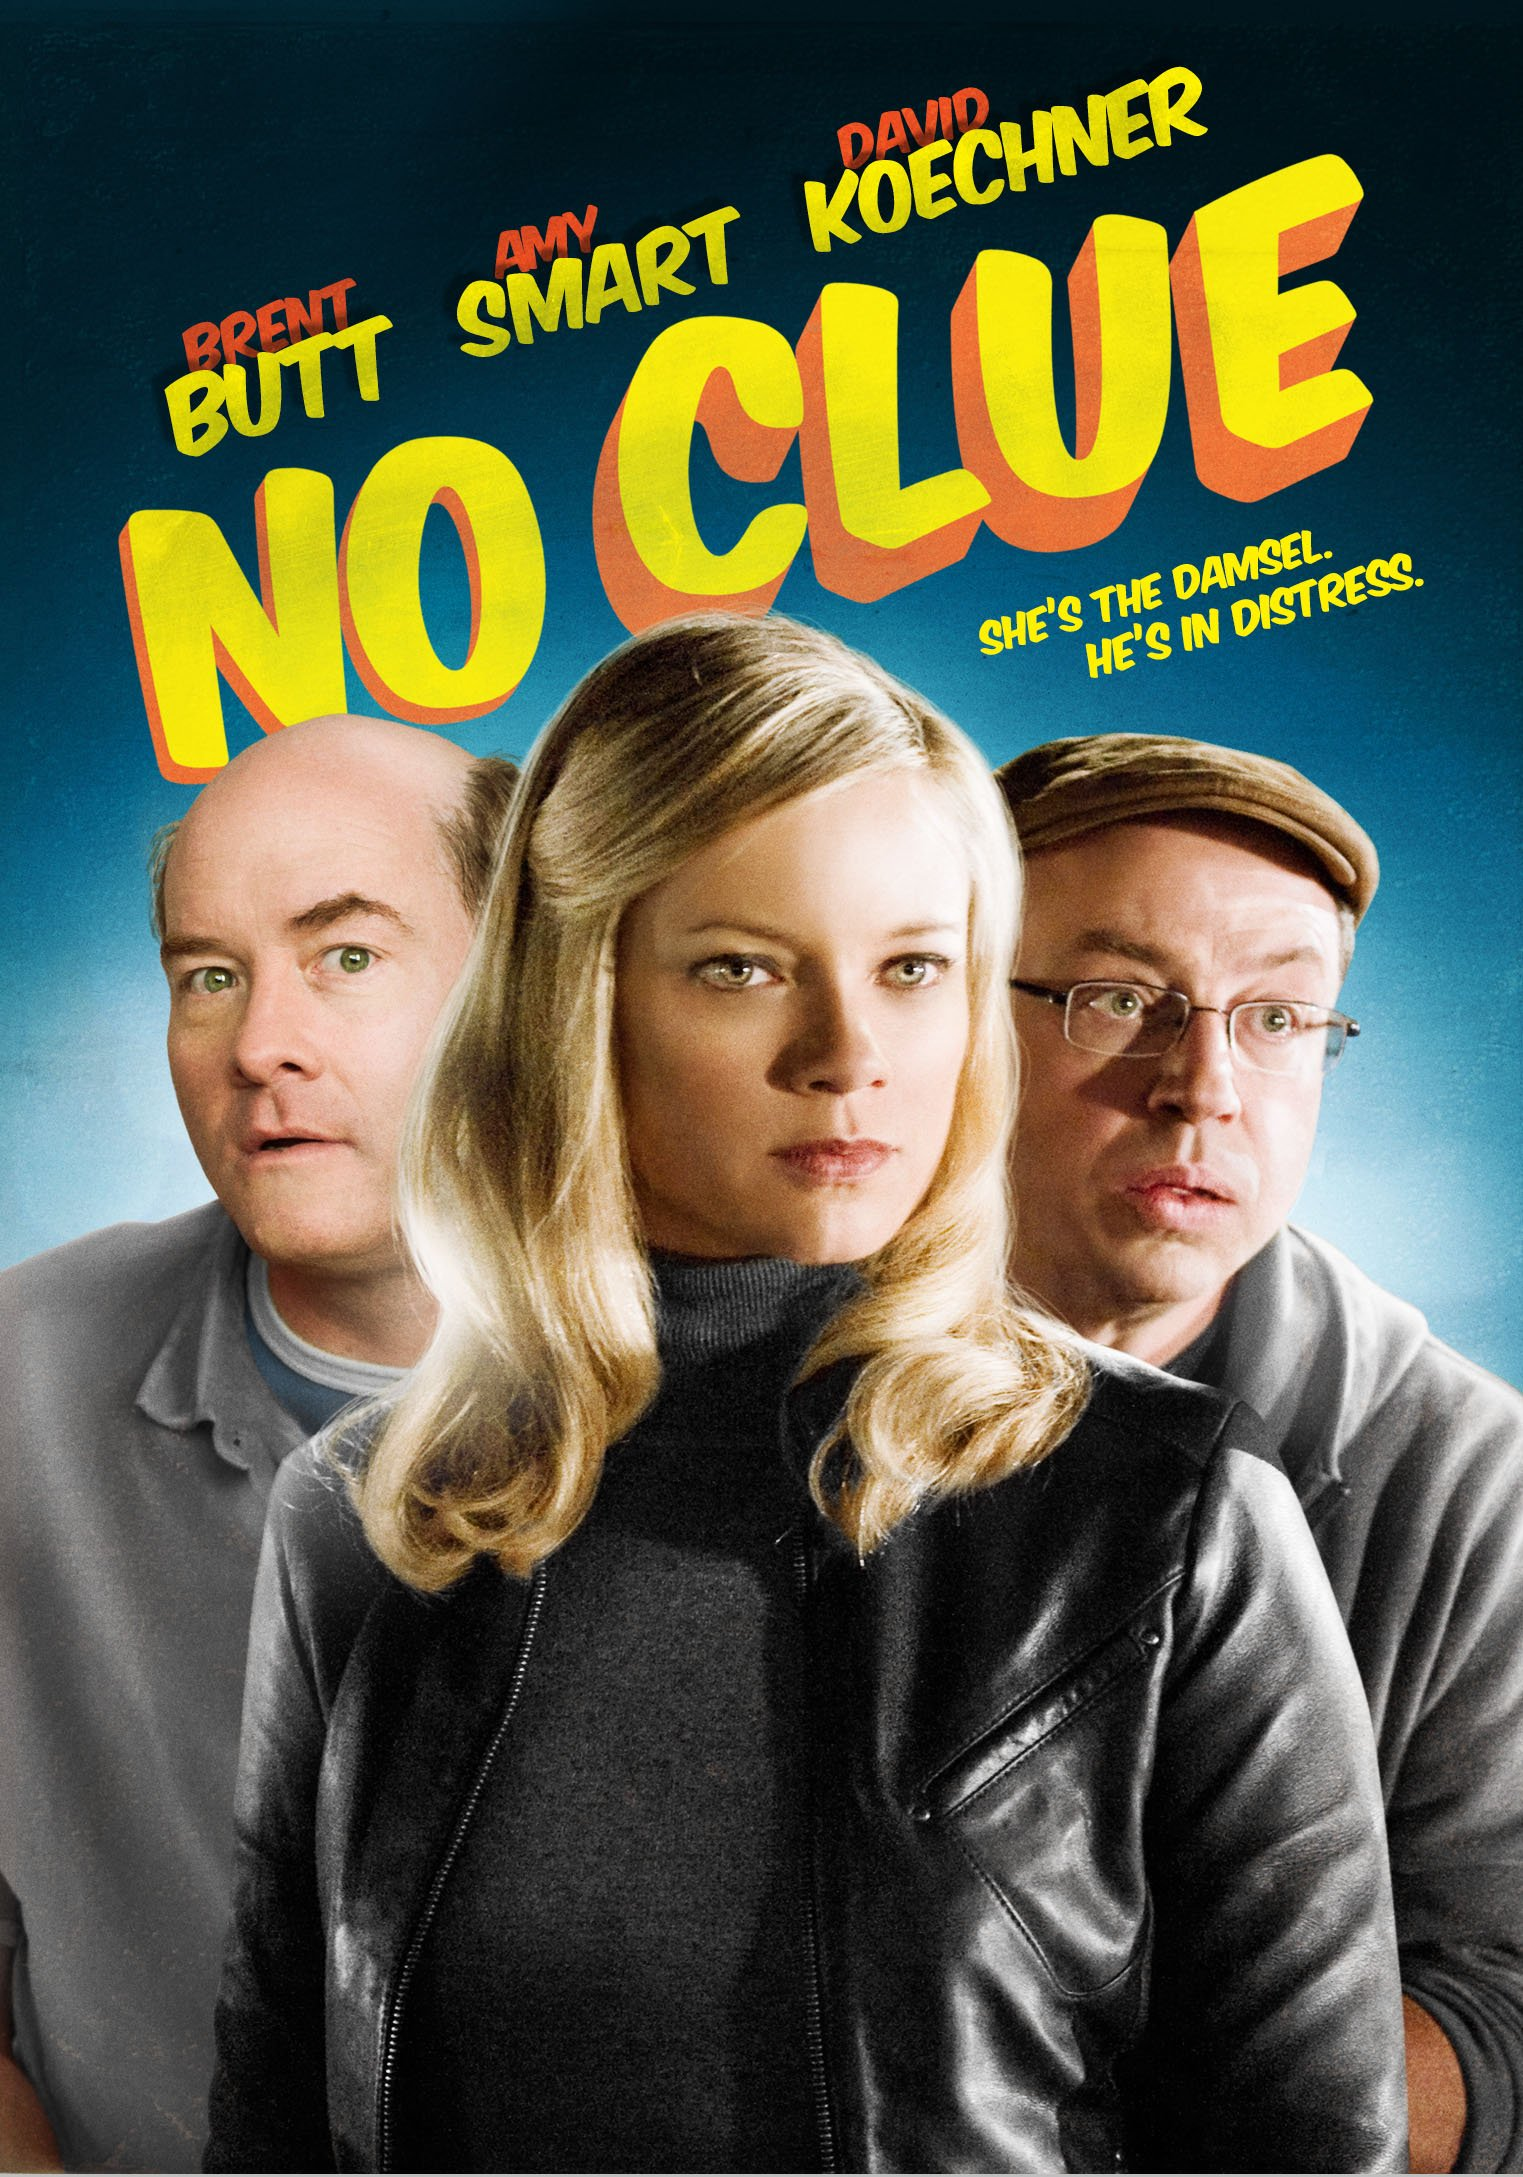 DVD : Amy Smart - No Clue (DVD)